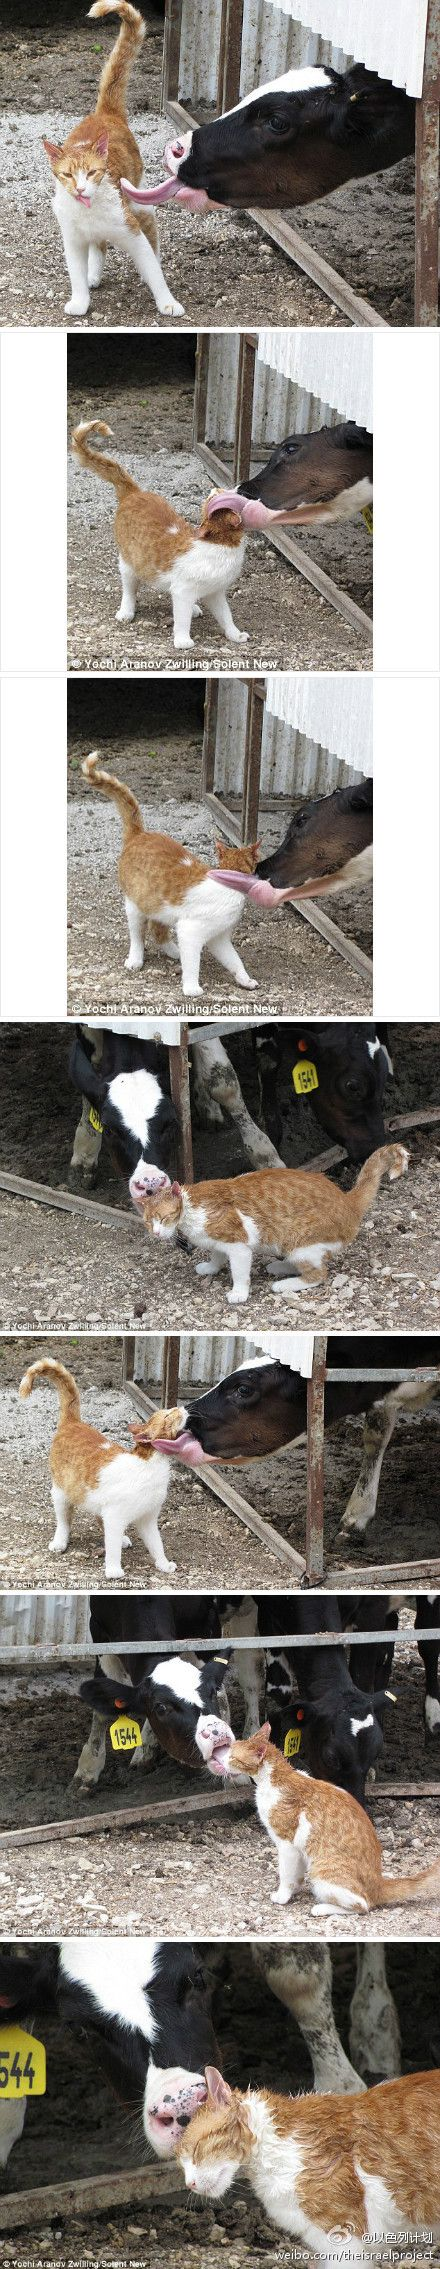 Farm friends....